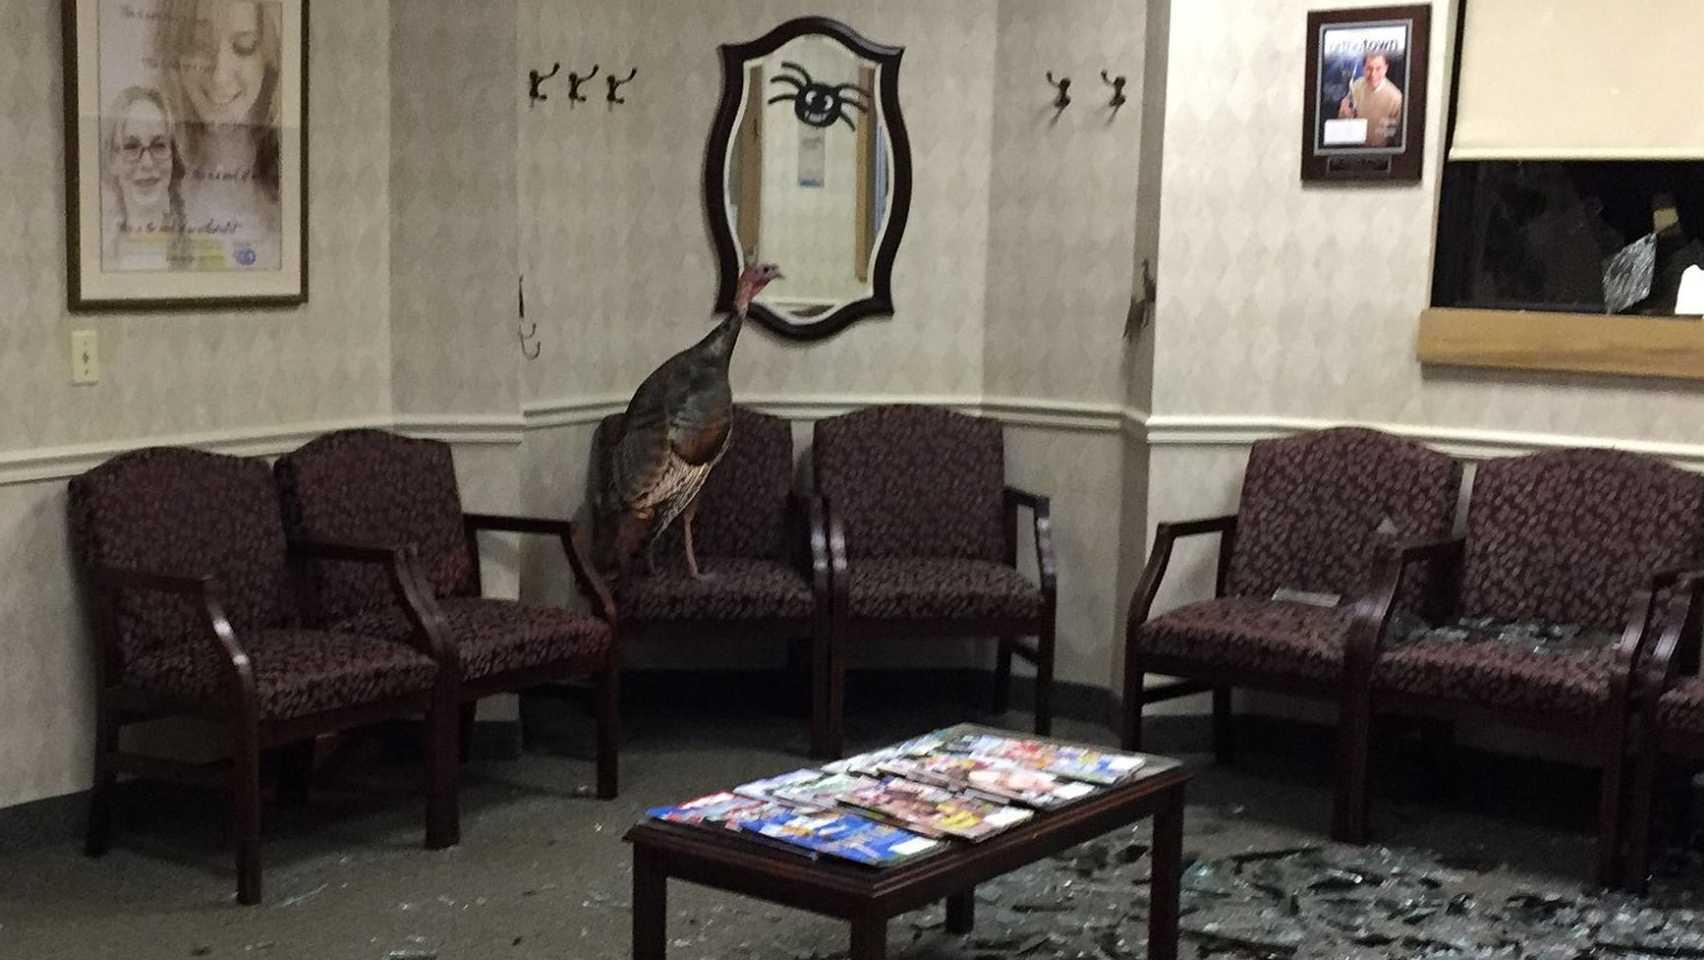 Turkey crashes through window into waiting room